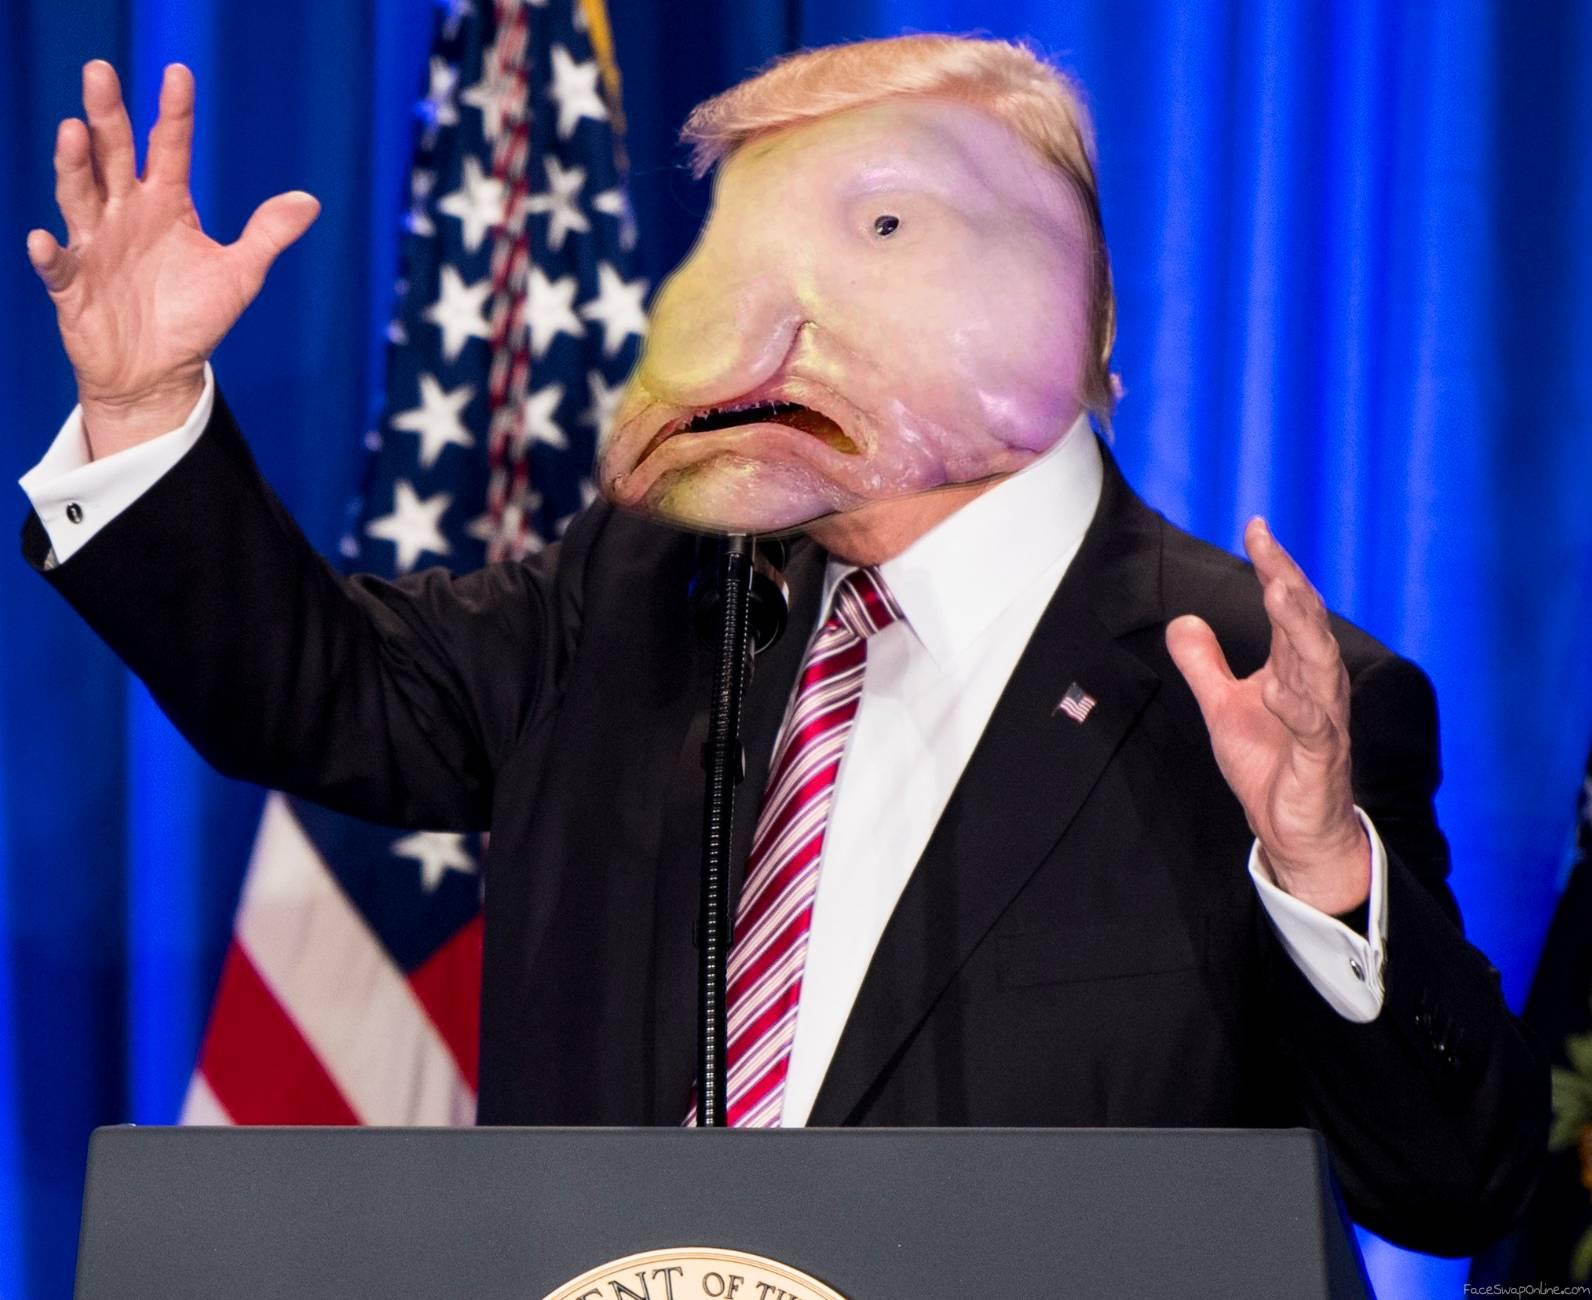 Blobfish Trump (no offence)